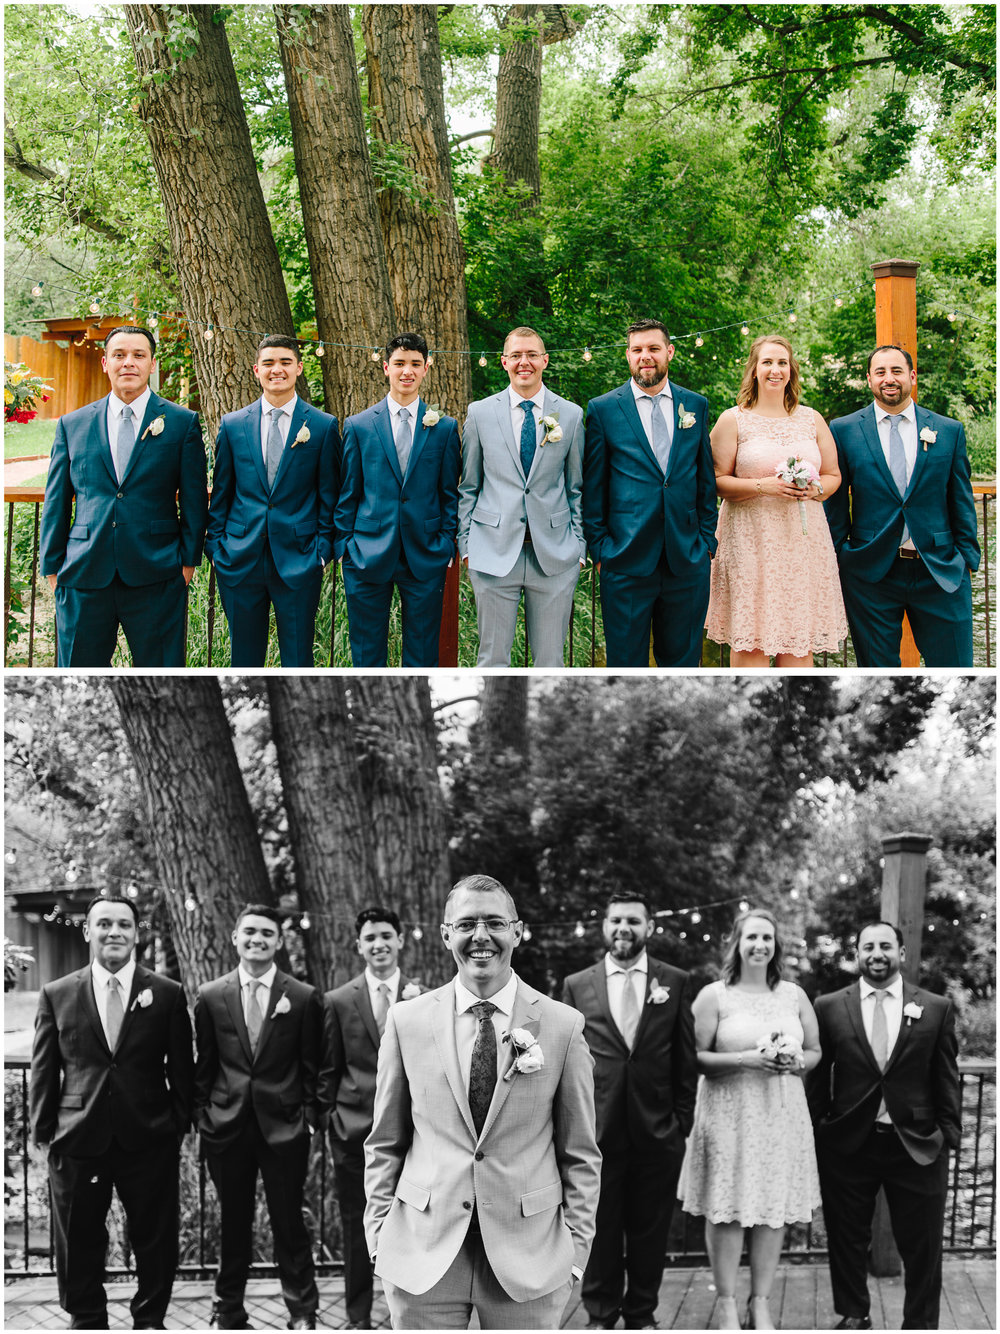 lyons_farmette_wedding_36.jpg